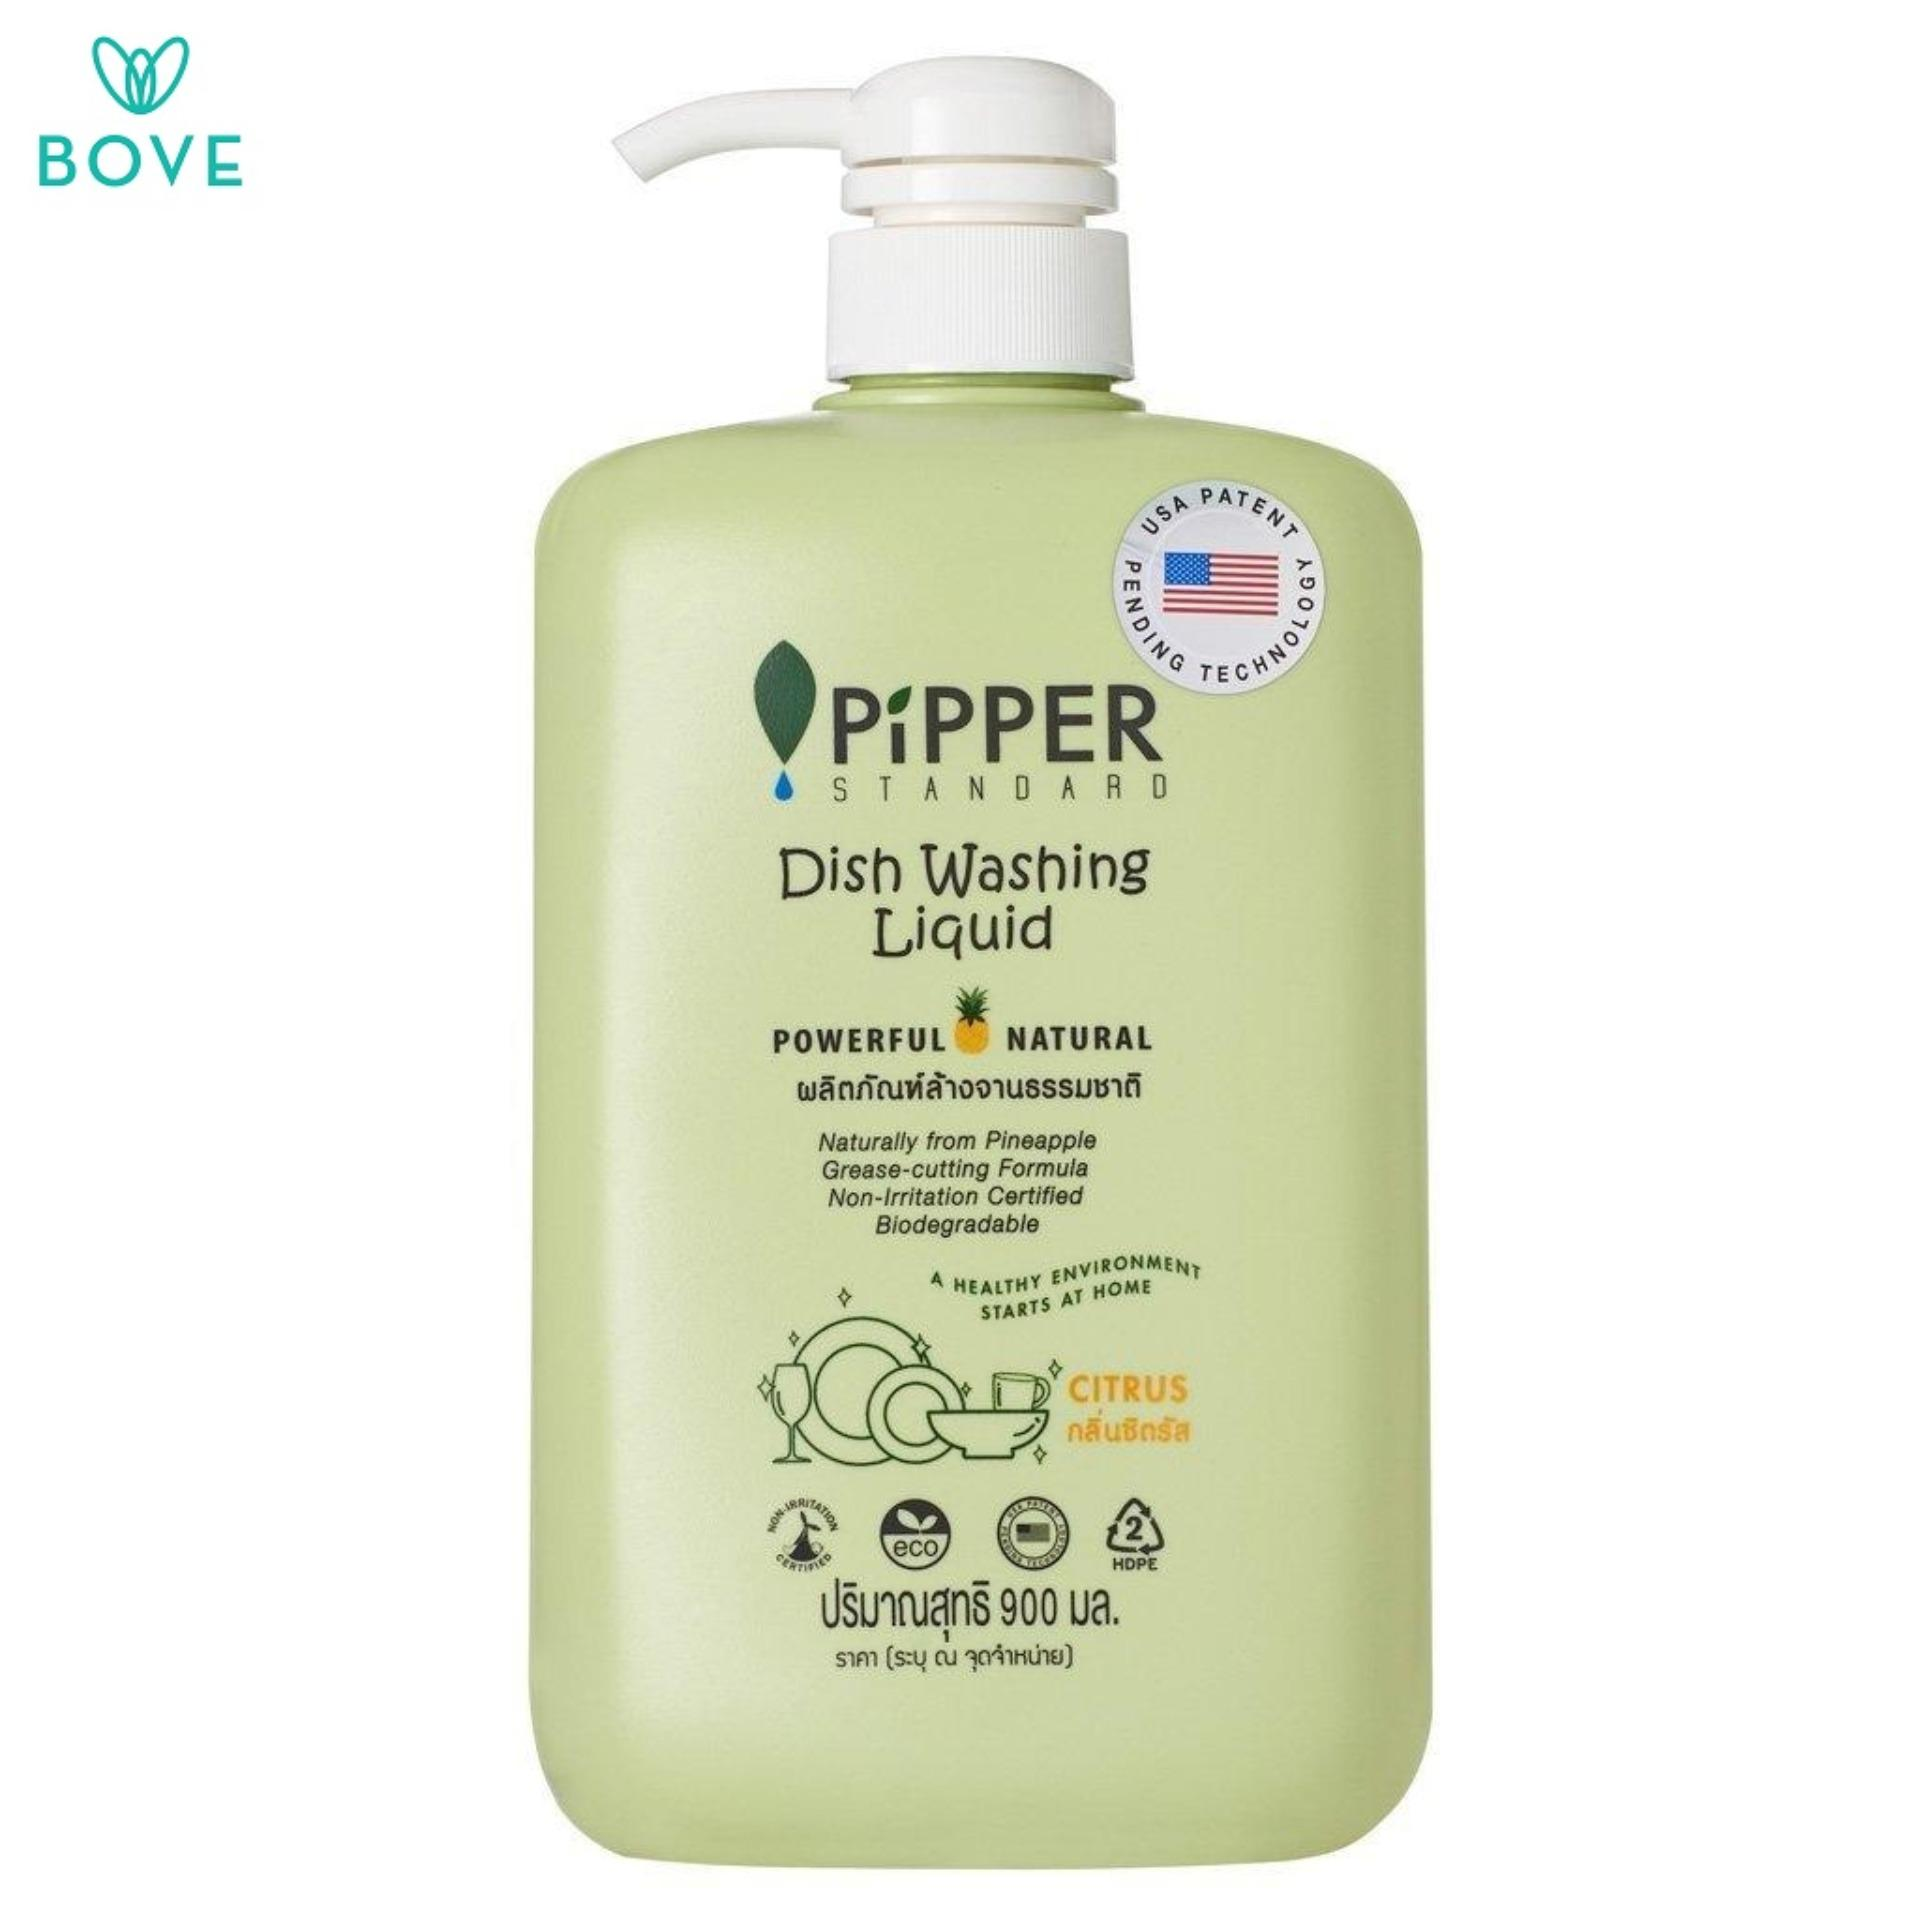 Pipper Standard Dish Washing Liquid Citrus By Bove.